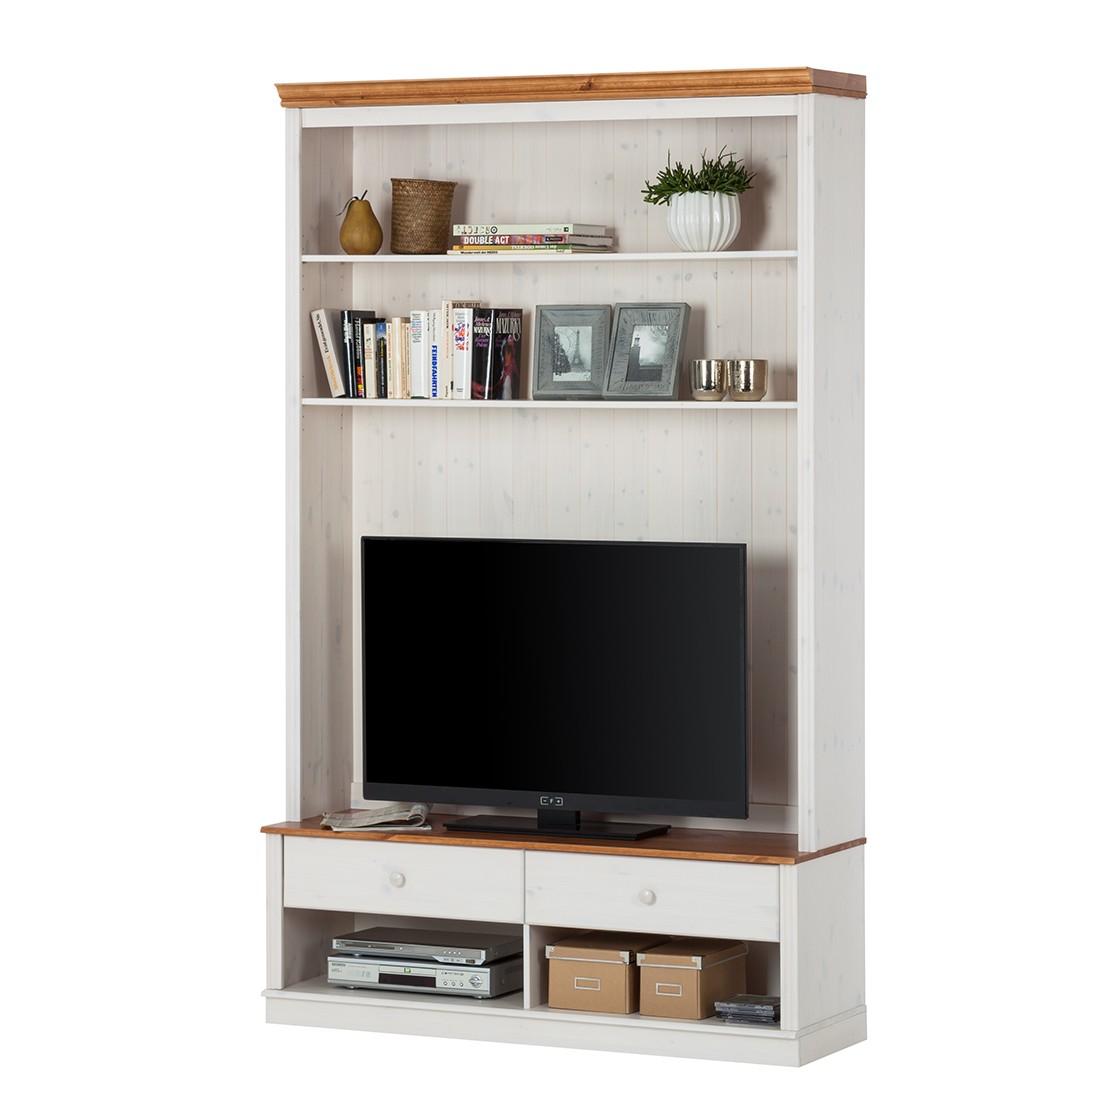 tv 140cm maison belfort preisvergleiche. Black Bedroom Furniture Sets. Home Design Ideas